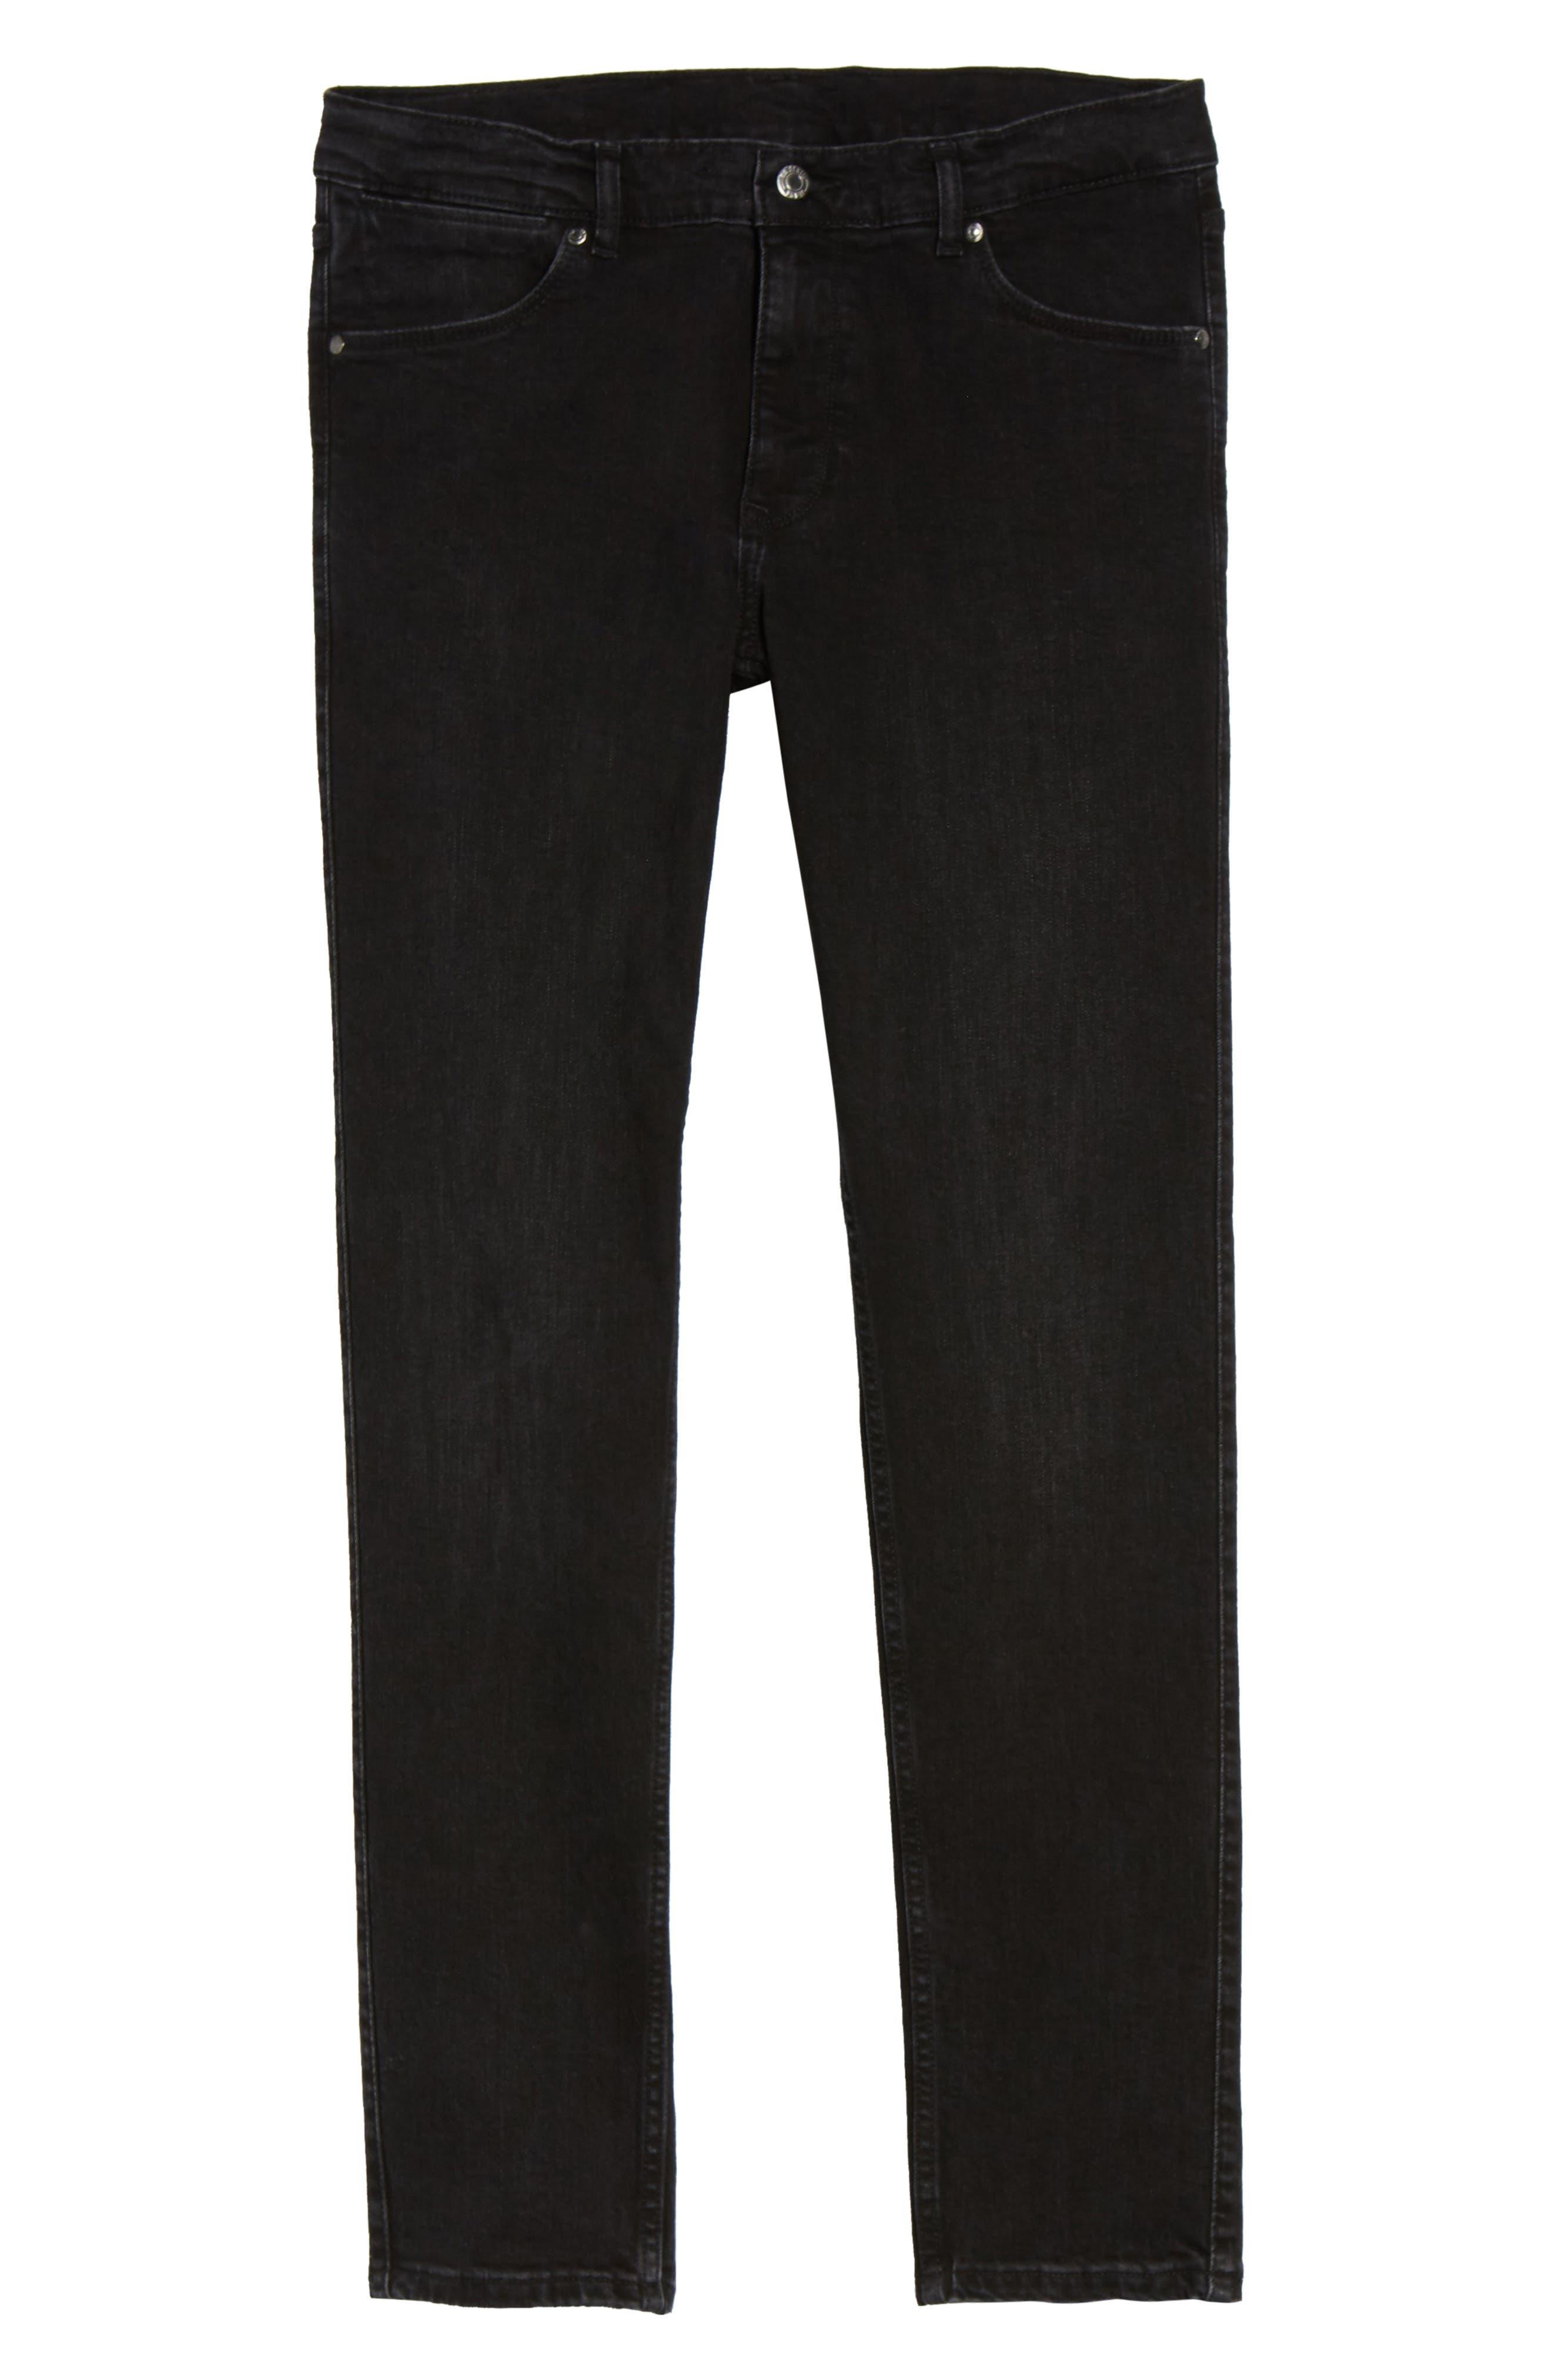 Clark Slim Straight Leg Jeans,                             Alternate thumbnail 6, color,                             Organic Worn Black